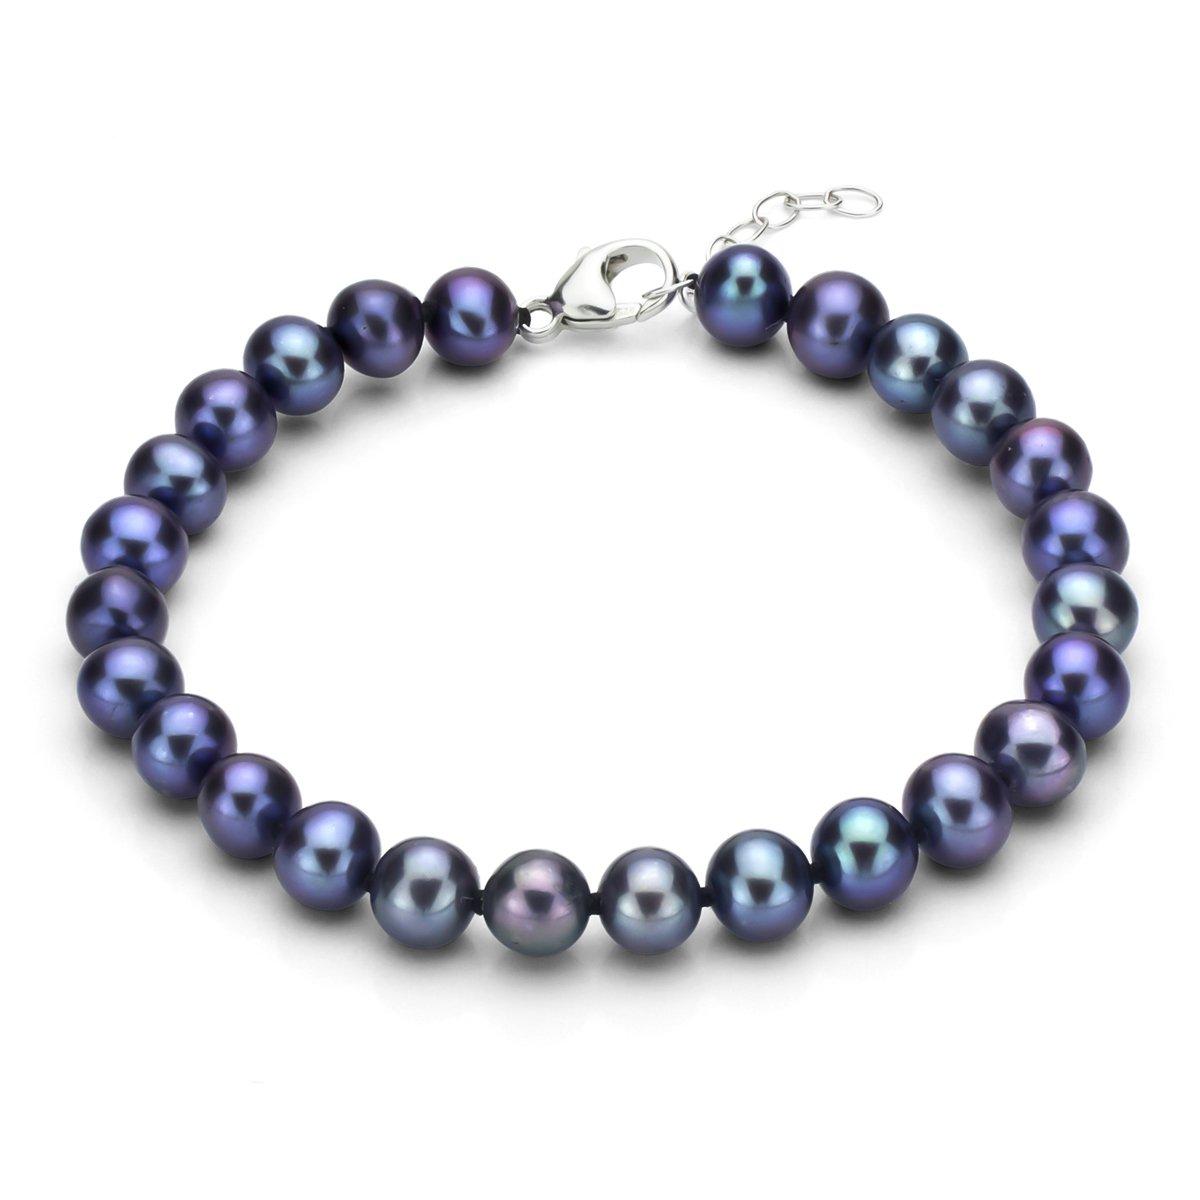 Sterling Silver 10-10.5mm Dyed-black Freshwater Cultured High Luster Pearl Bracelet, 7.5'' + 1''